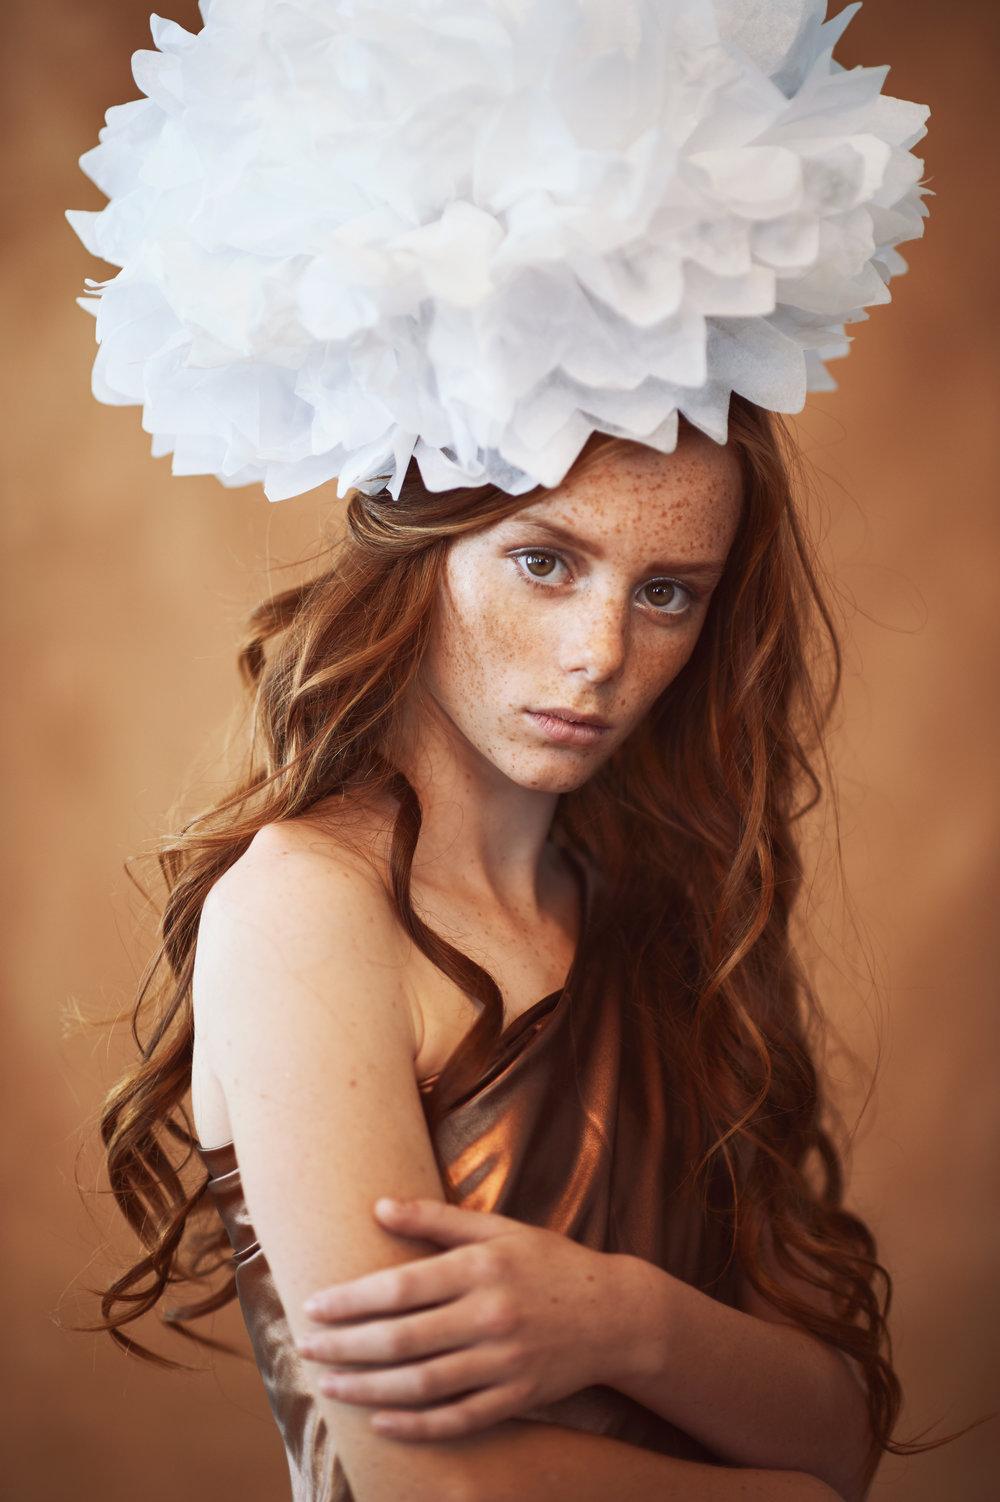 Marta-Hewson-Themed-portrait-red-head-freckles-paper-flower.jpg